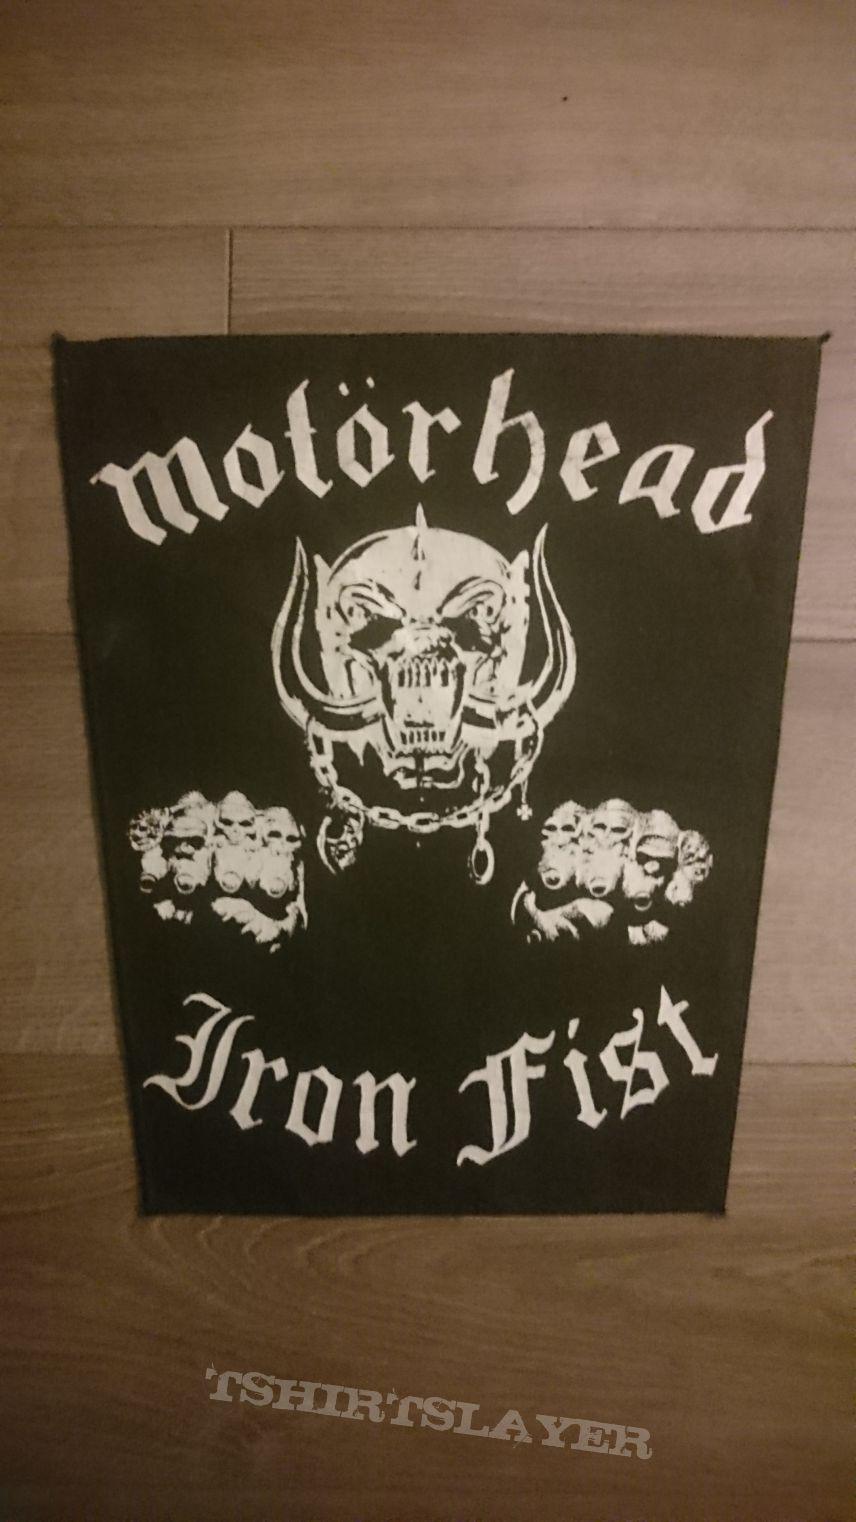 Motörhead - Iron Fist Back Patch (White)